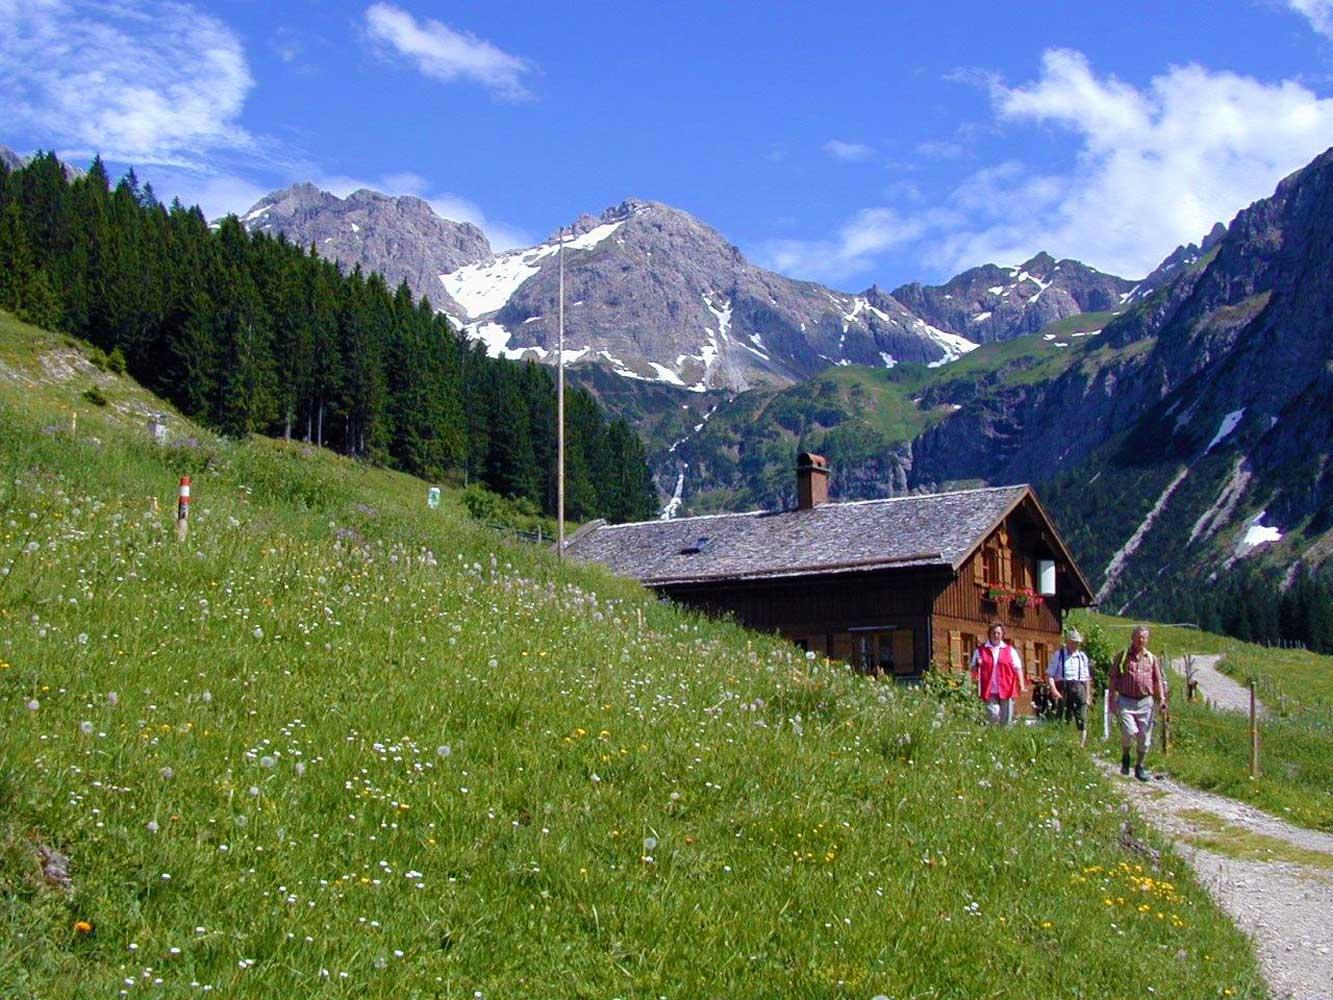 Innere Wiesalpe Kleinwalsertal, Ausflugsziel, Alpe, Brotzeit – Bergpanorama